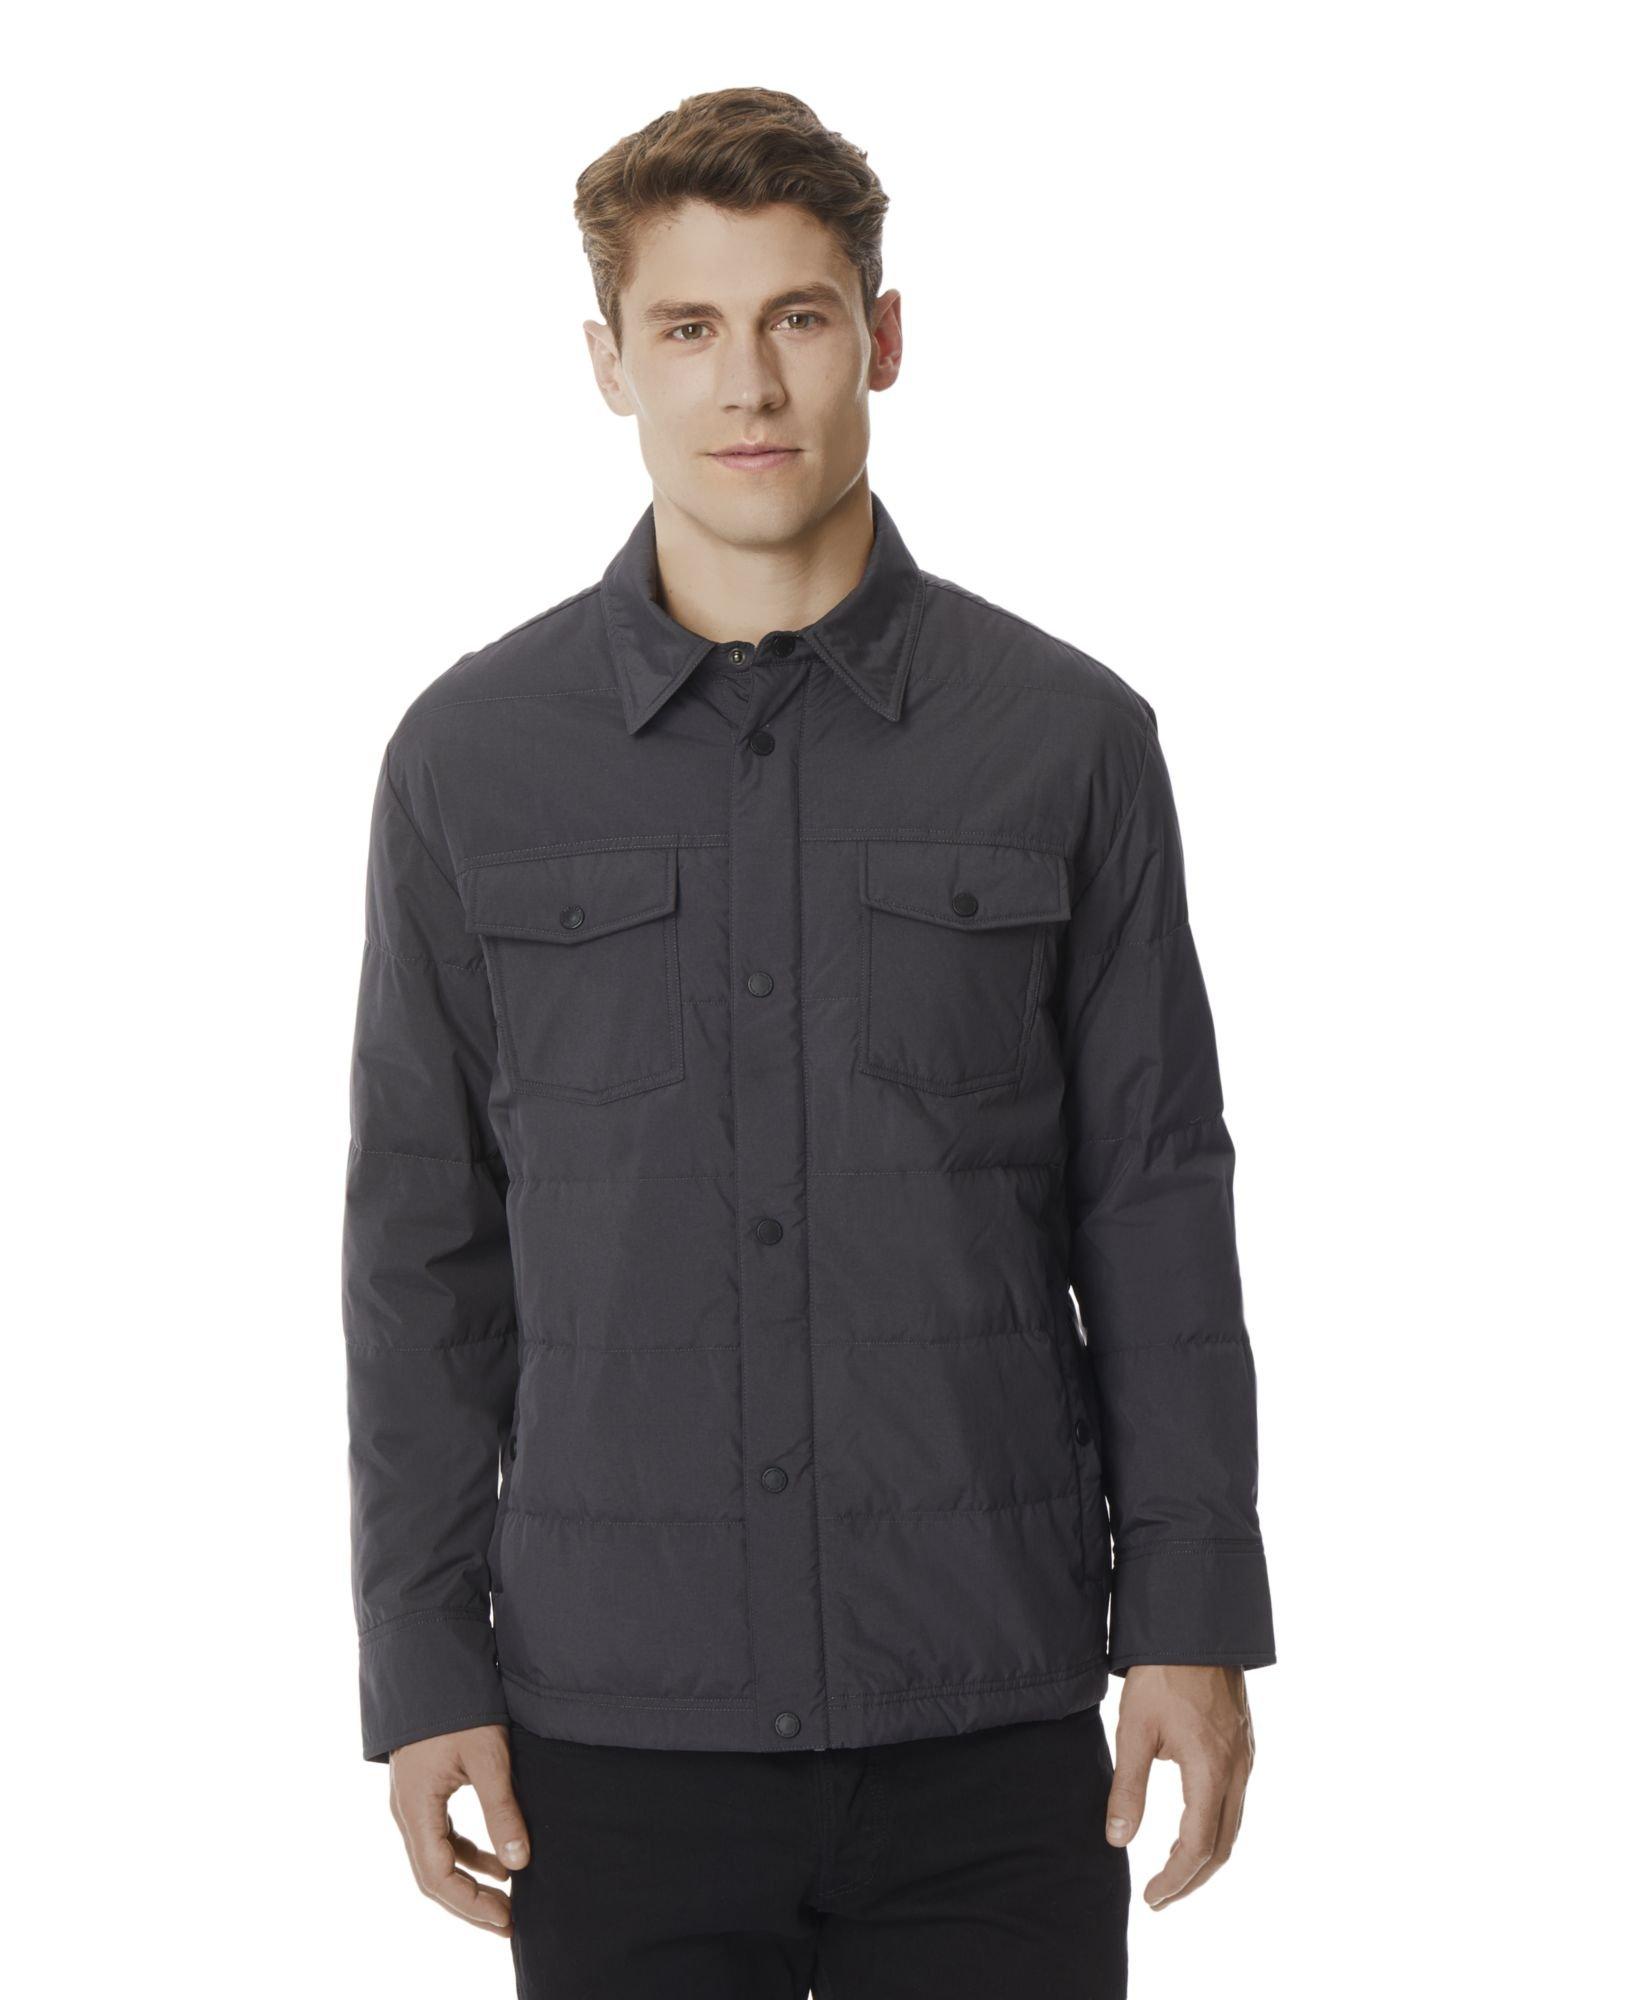 32 DEGREES Men's Packable Down Shirt Jacket -Iron-XL